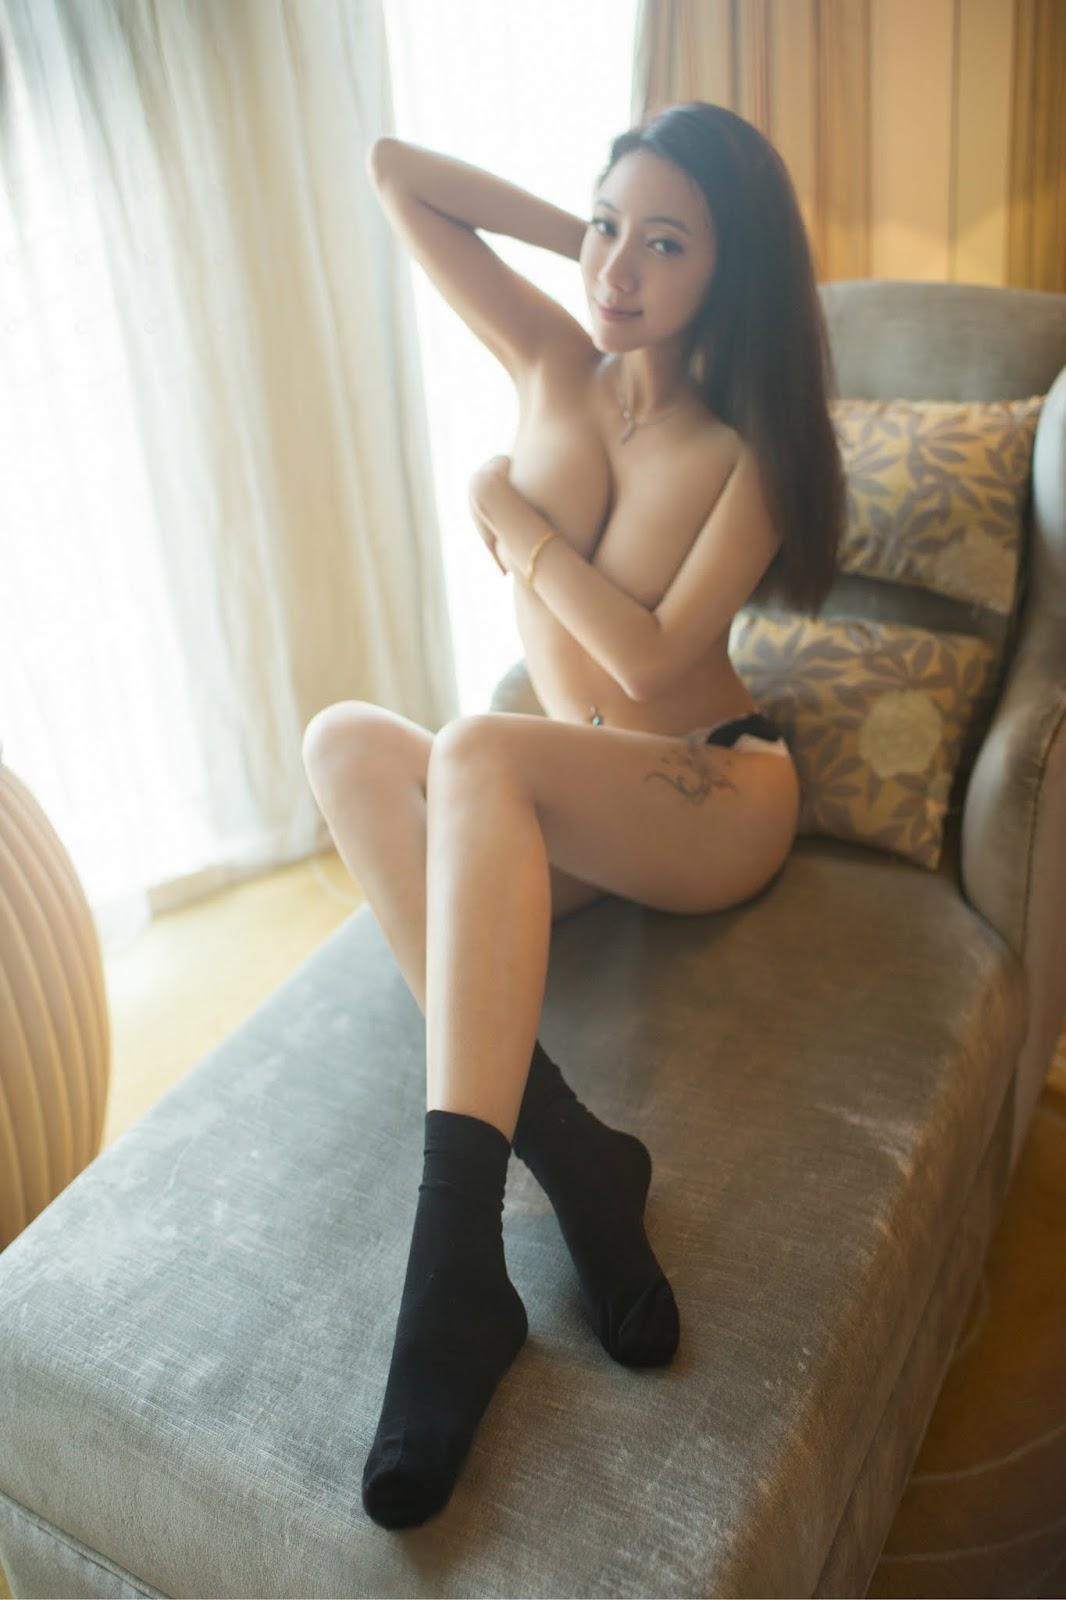 %252B%25C2%25A6v%25C2%25A6%25C2%25B7 32 meitu 14 - Sexy Girl Model TUIGIRL NO.58